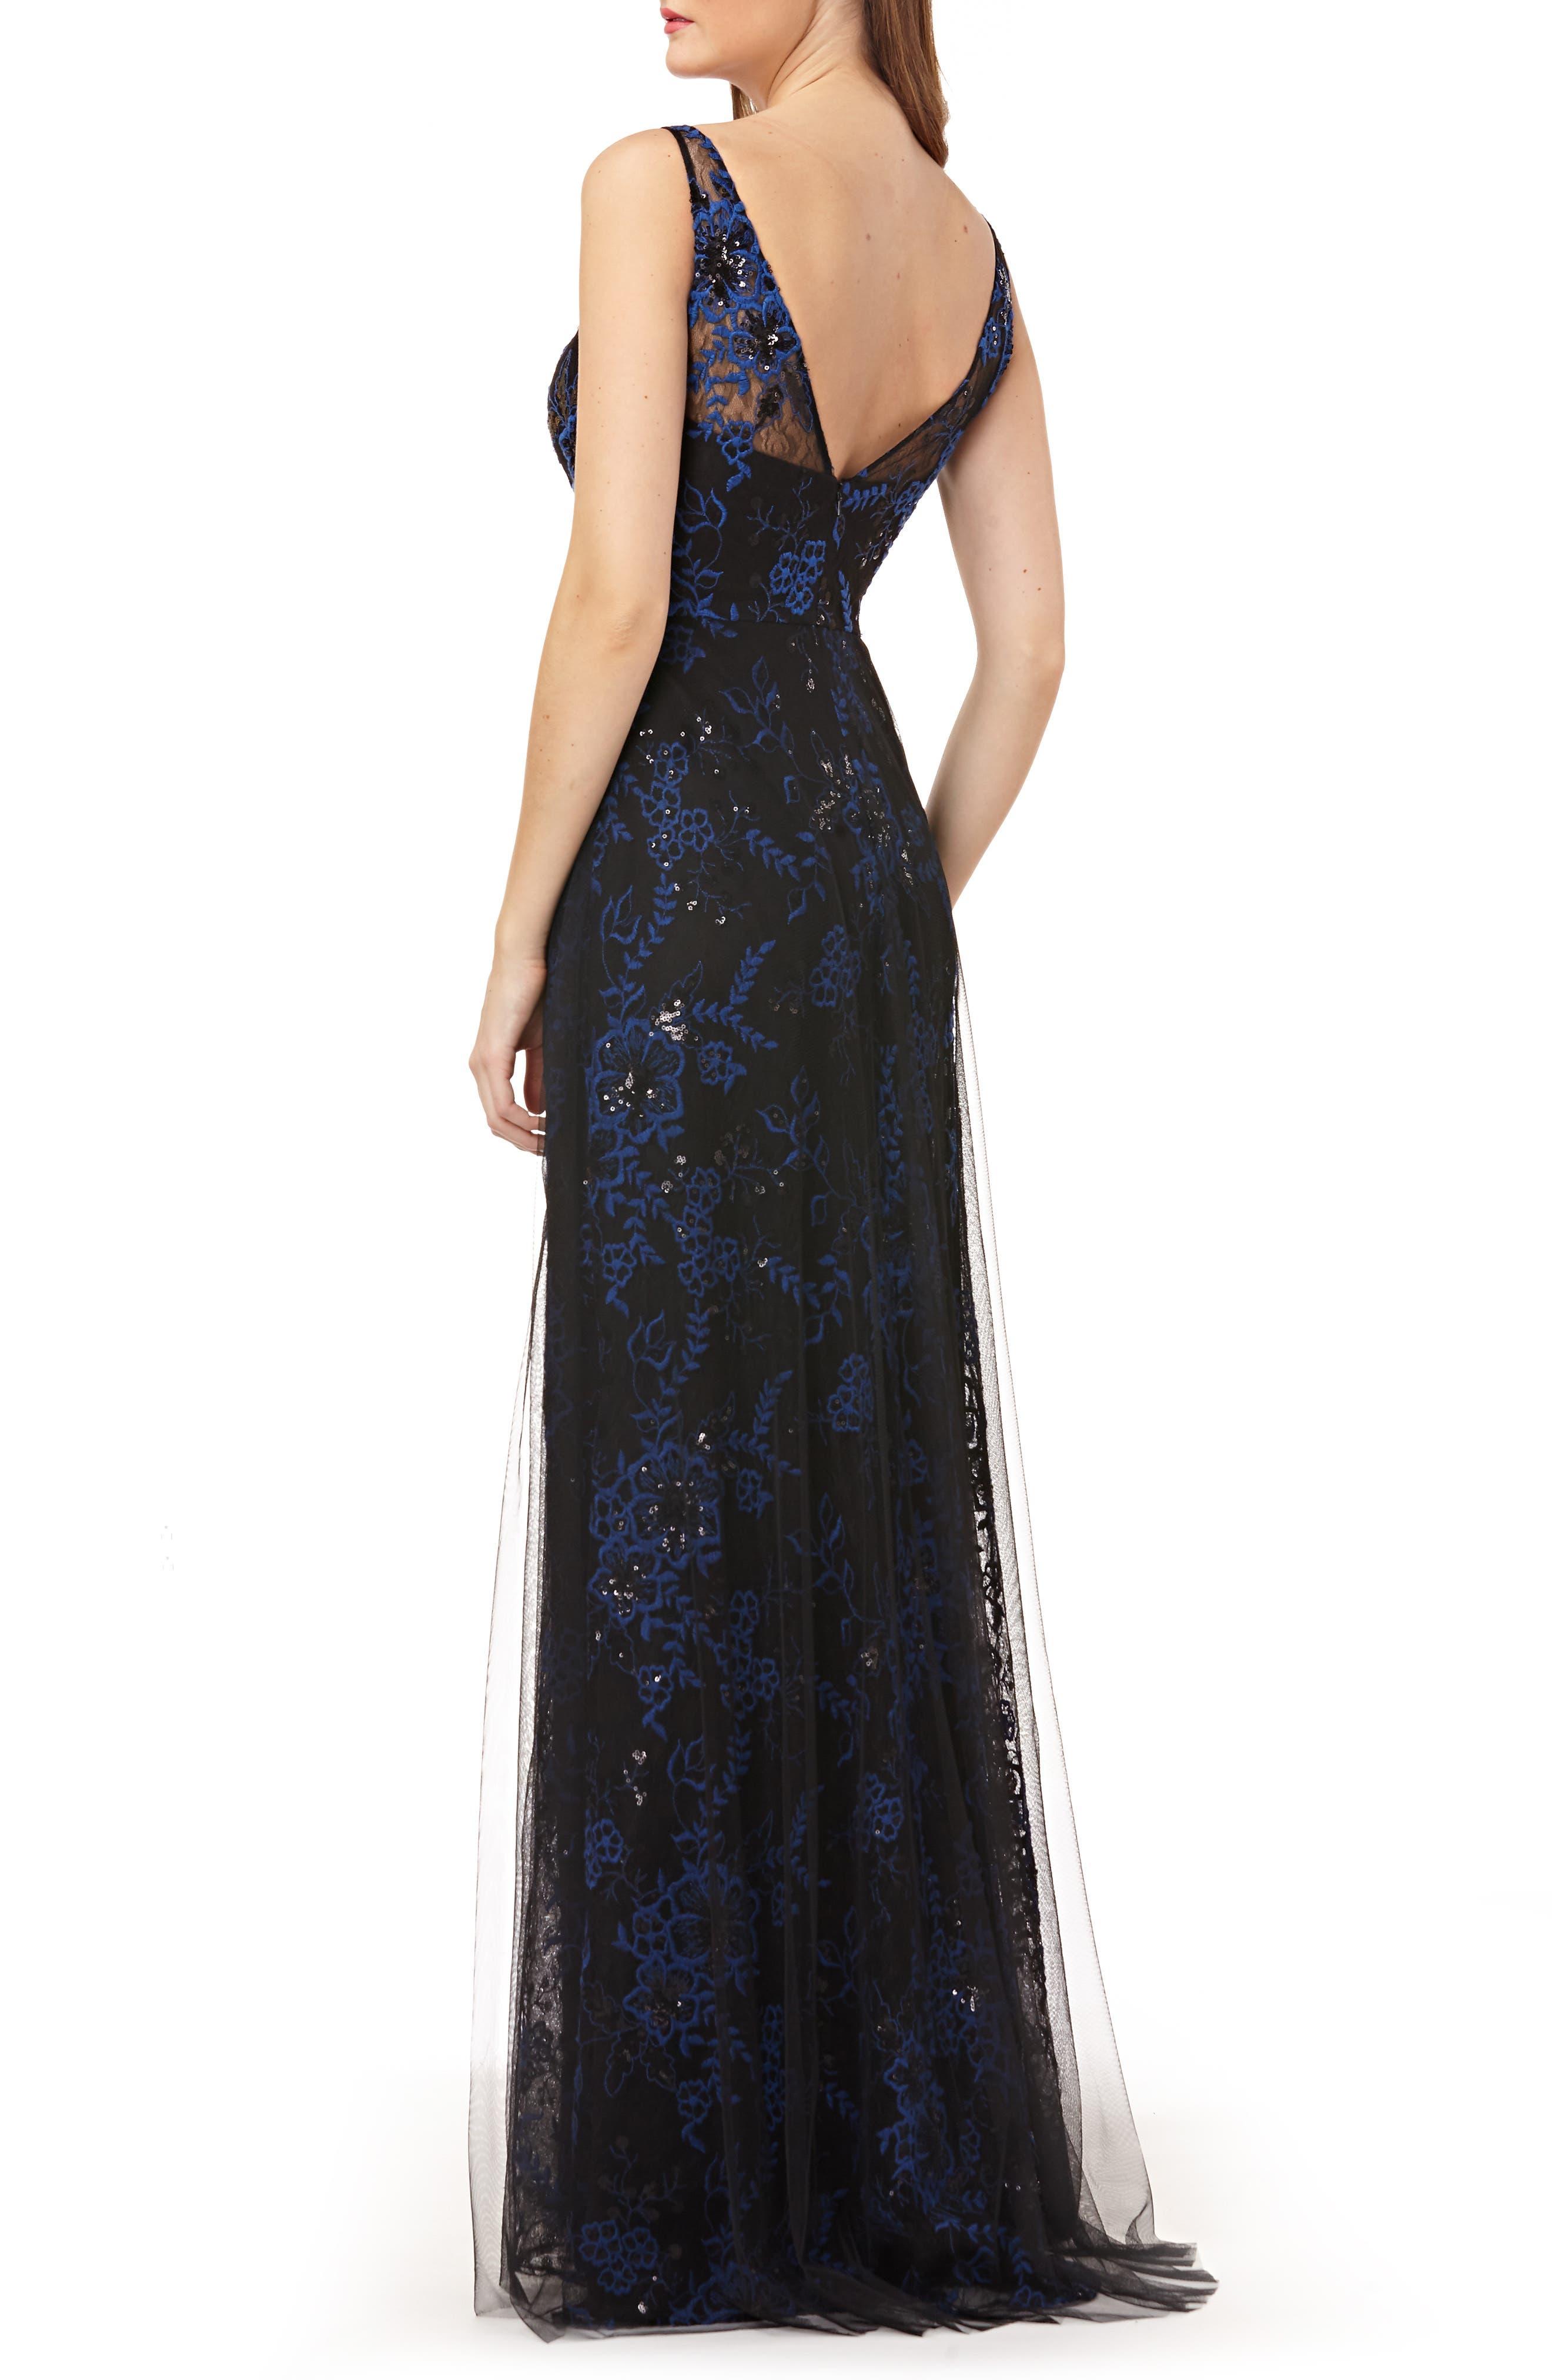 CARMEN MARC VALVO INFUSION,                             Sequin Threadwork Gown,                             Alternate thumbnail 2, color,                             COBALT/ BLACK